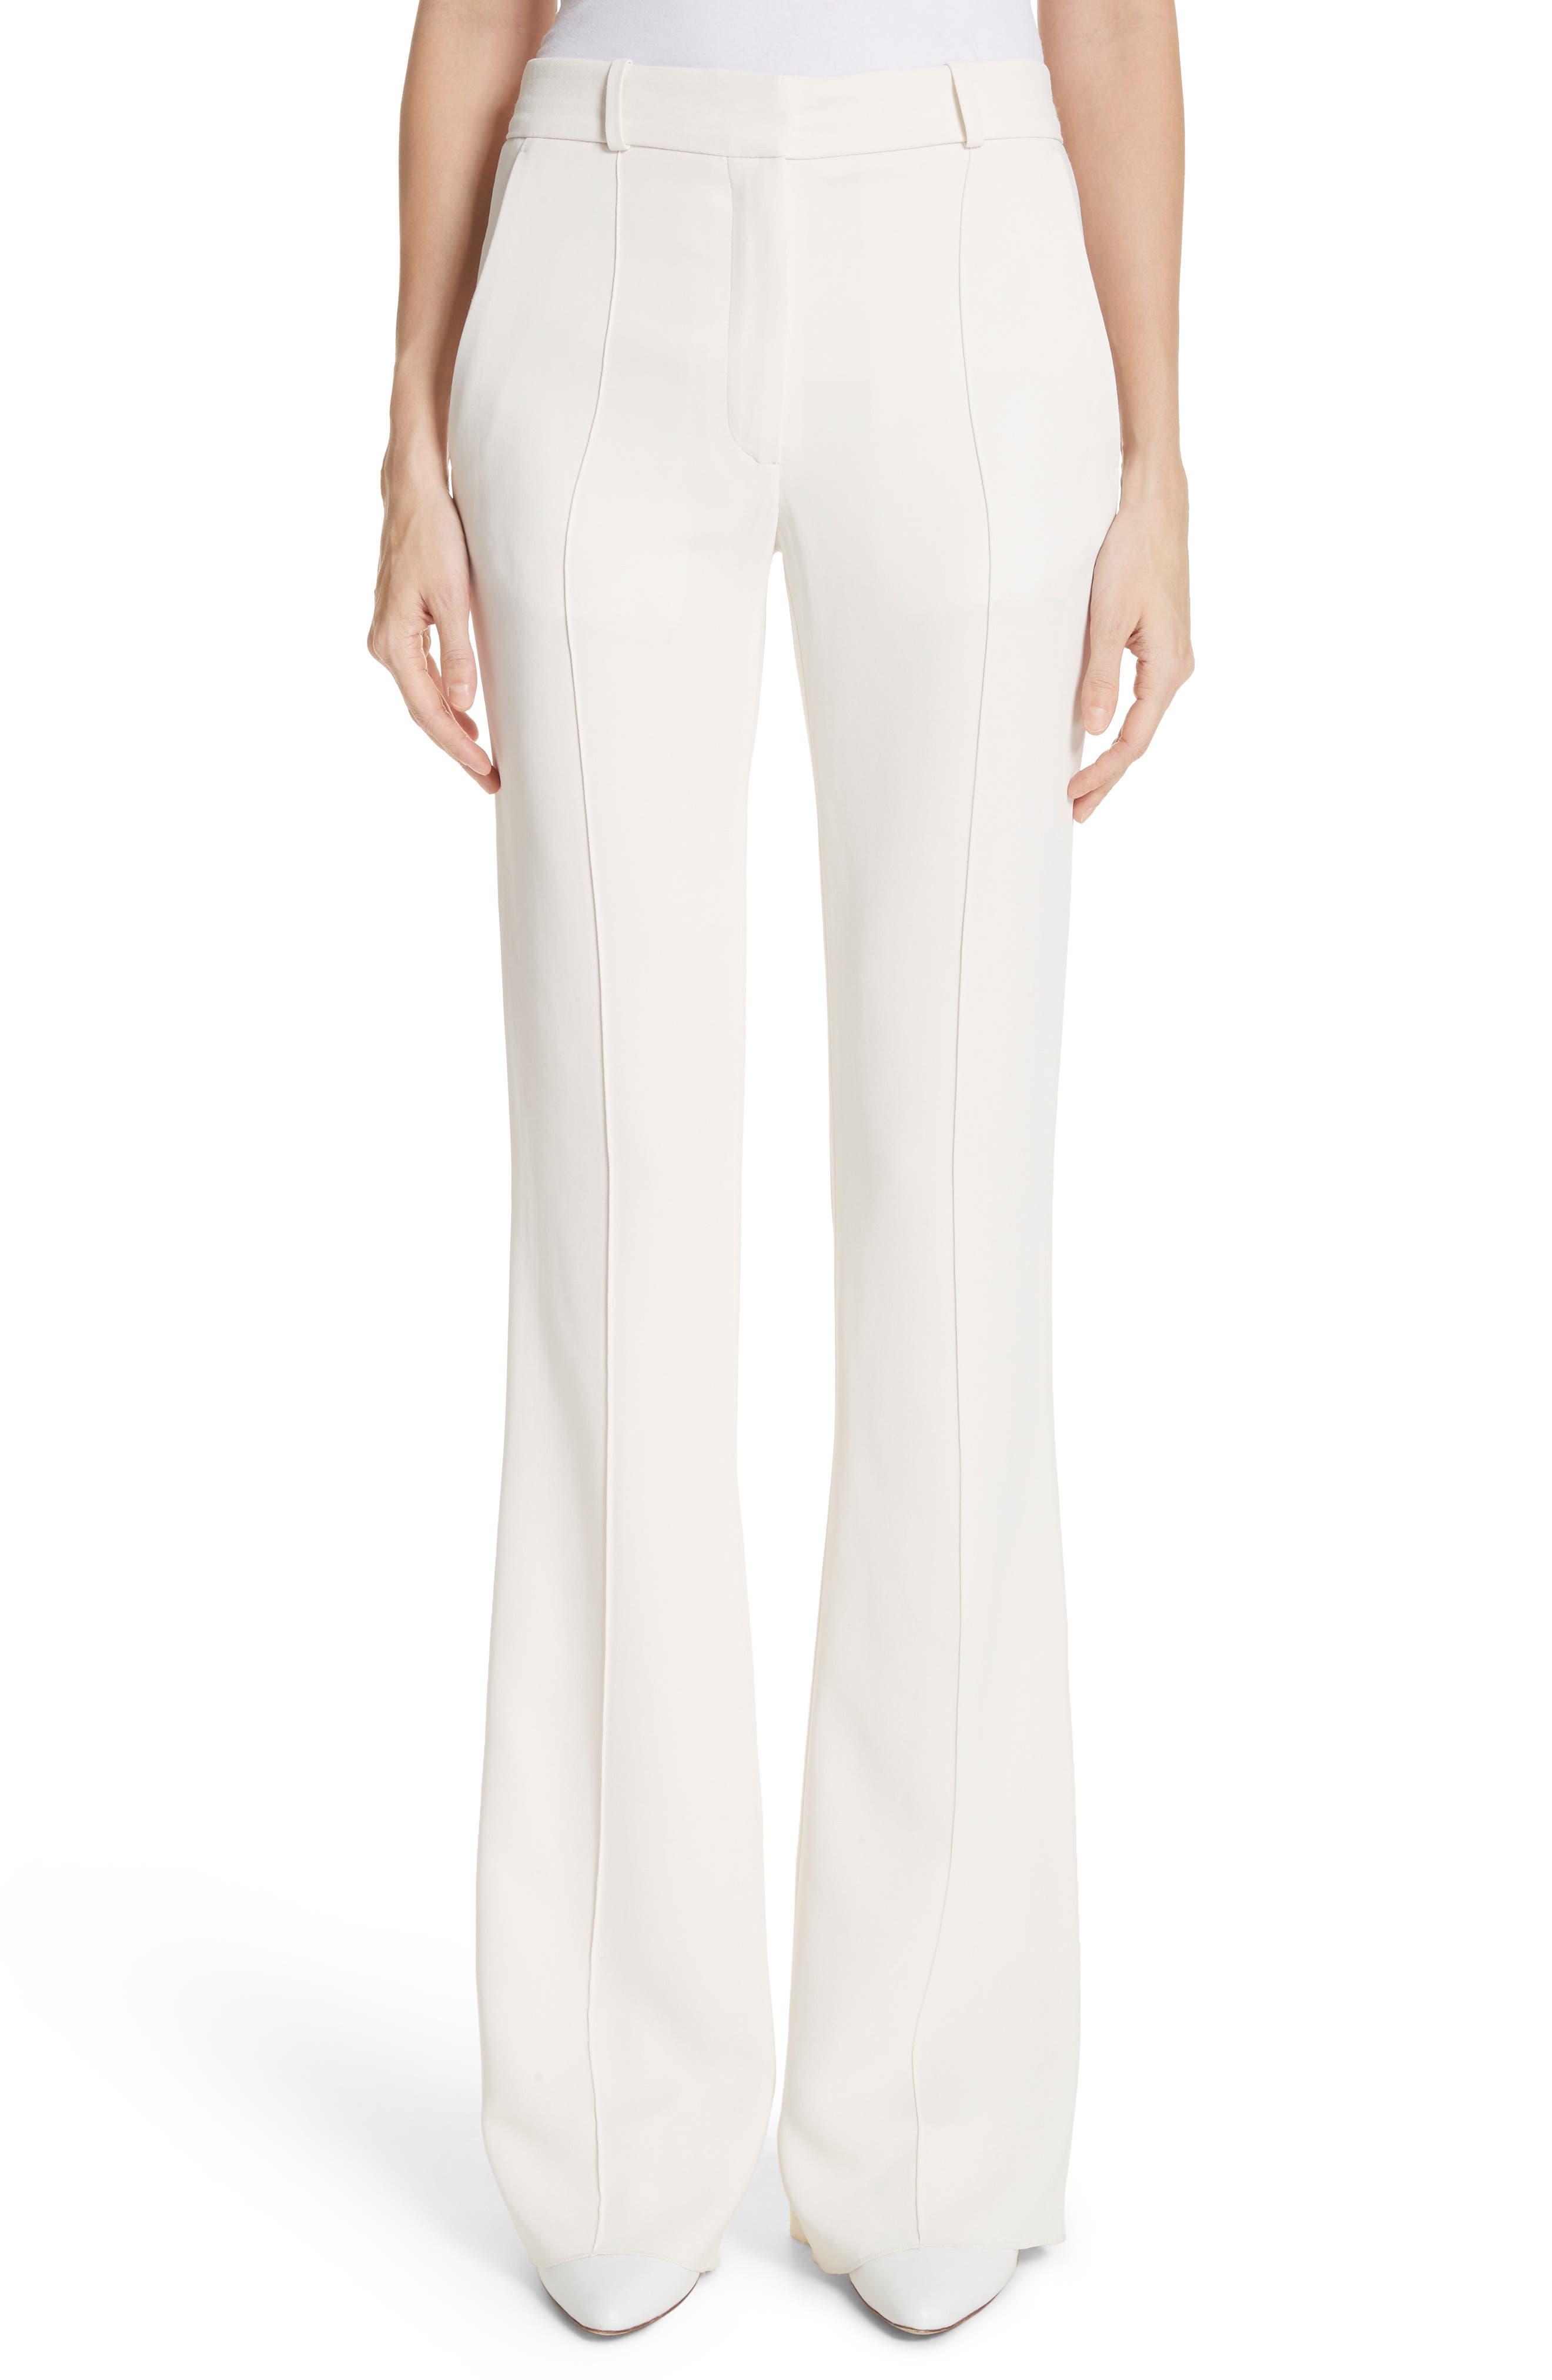 Victoria Beckham Flare Pants